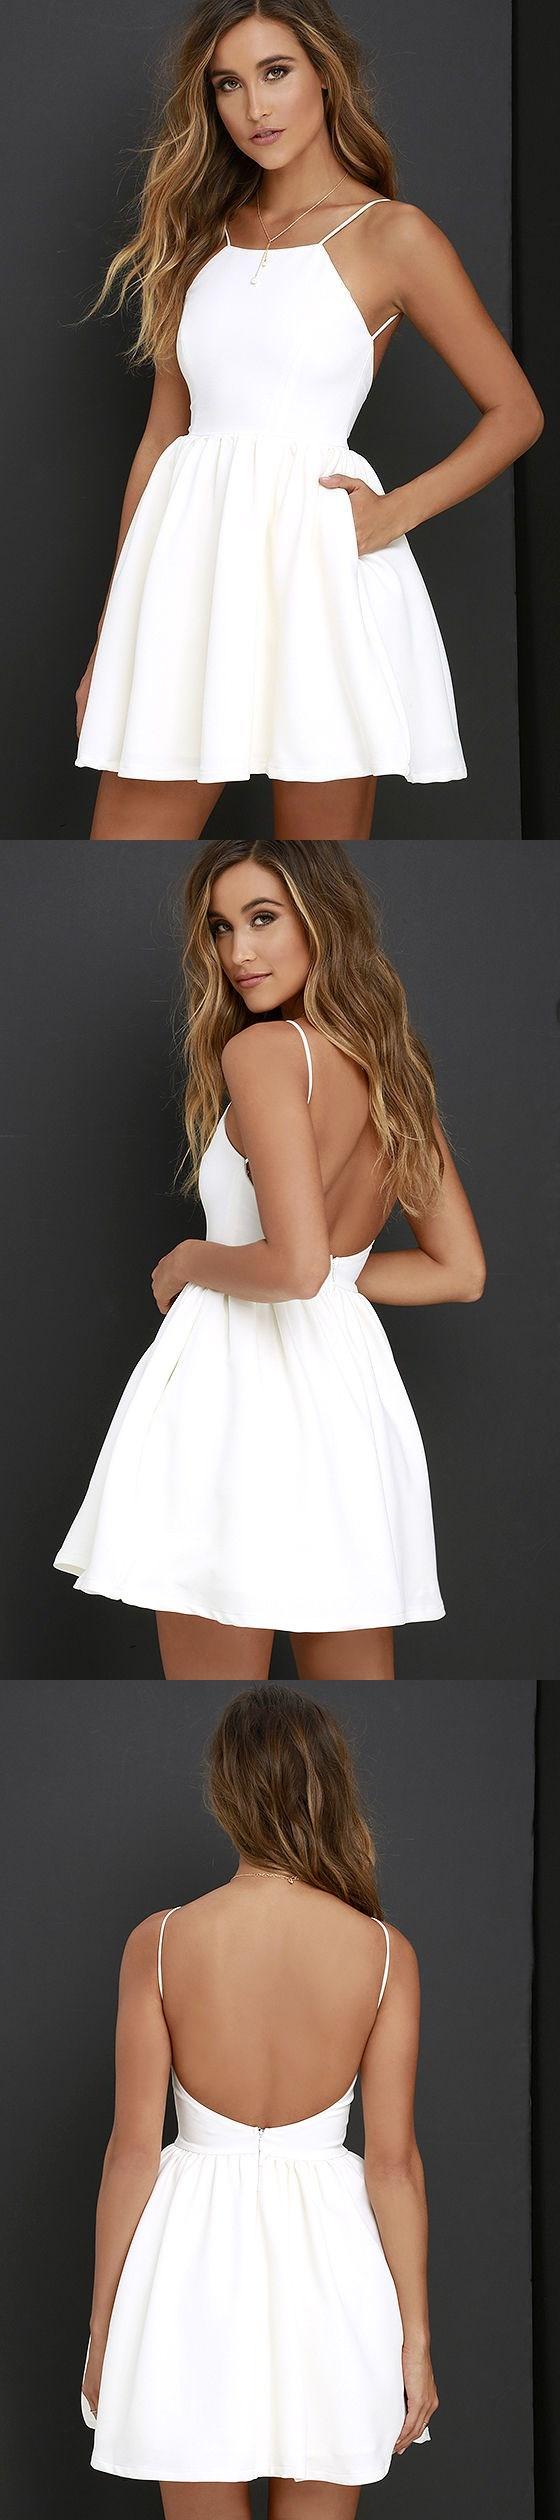 Flossy Size Dress Amazon Short Sexy Prom Short Sexy Prom Dress Dress wedding dress Simple White Dress